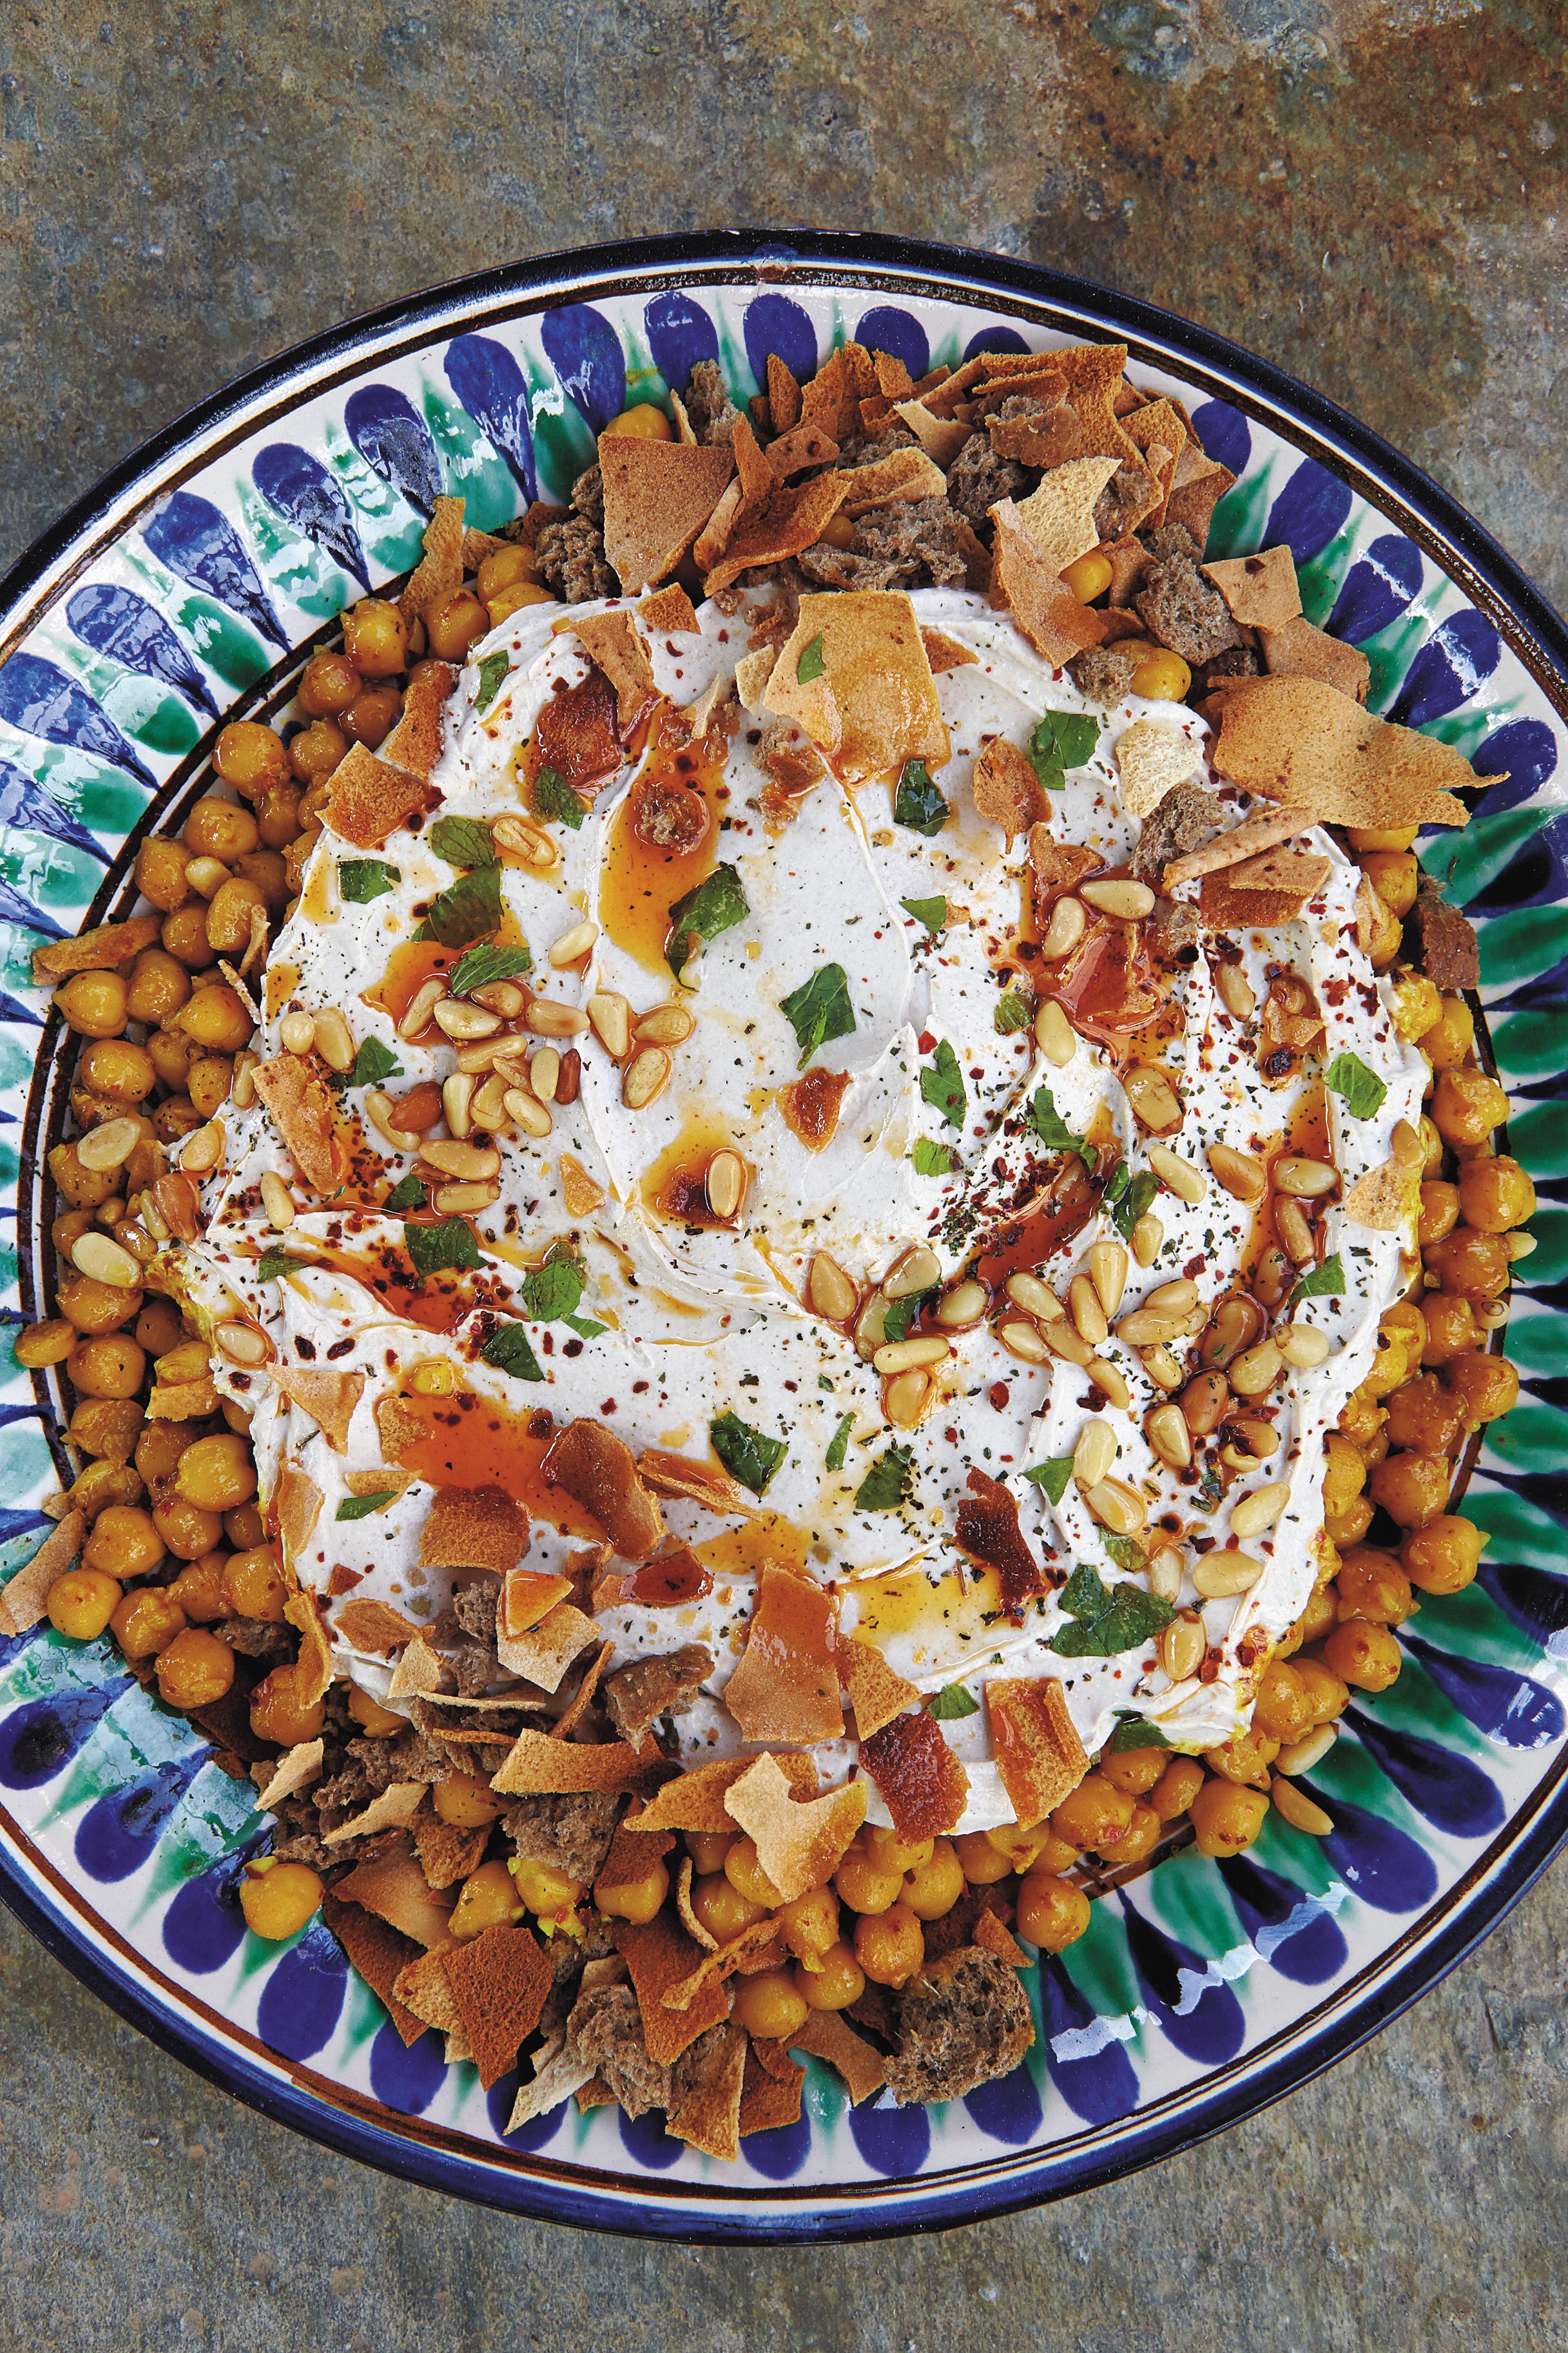 Aglaia's Chickpeas and Toasted Bread with Tahini-Yogurt Sauce (Fattat Hummus)